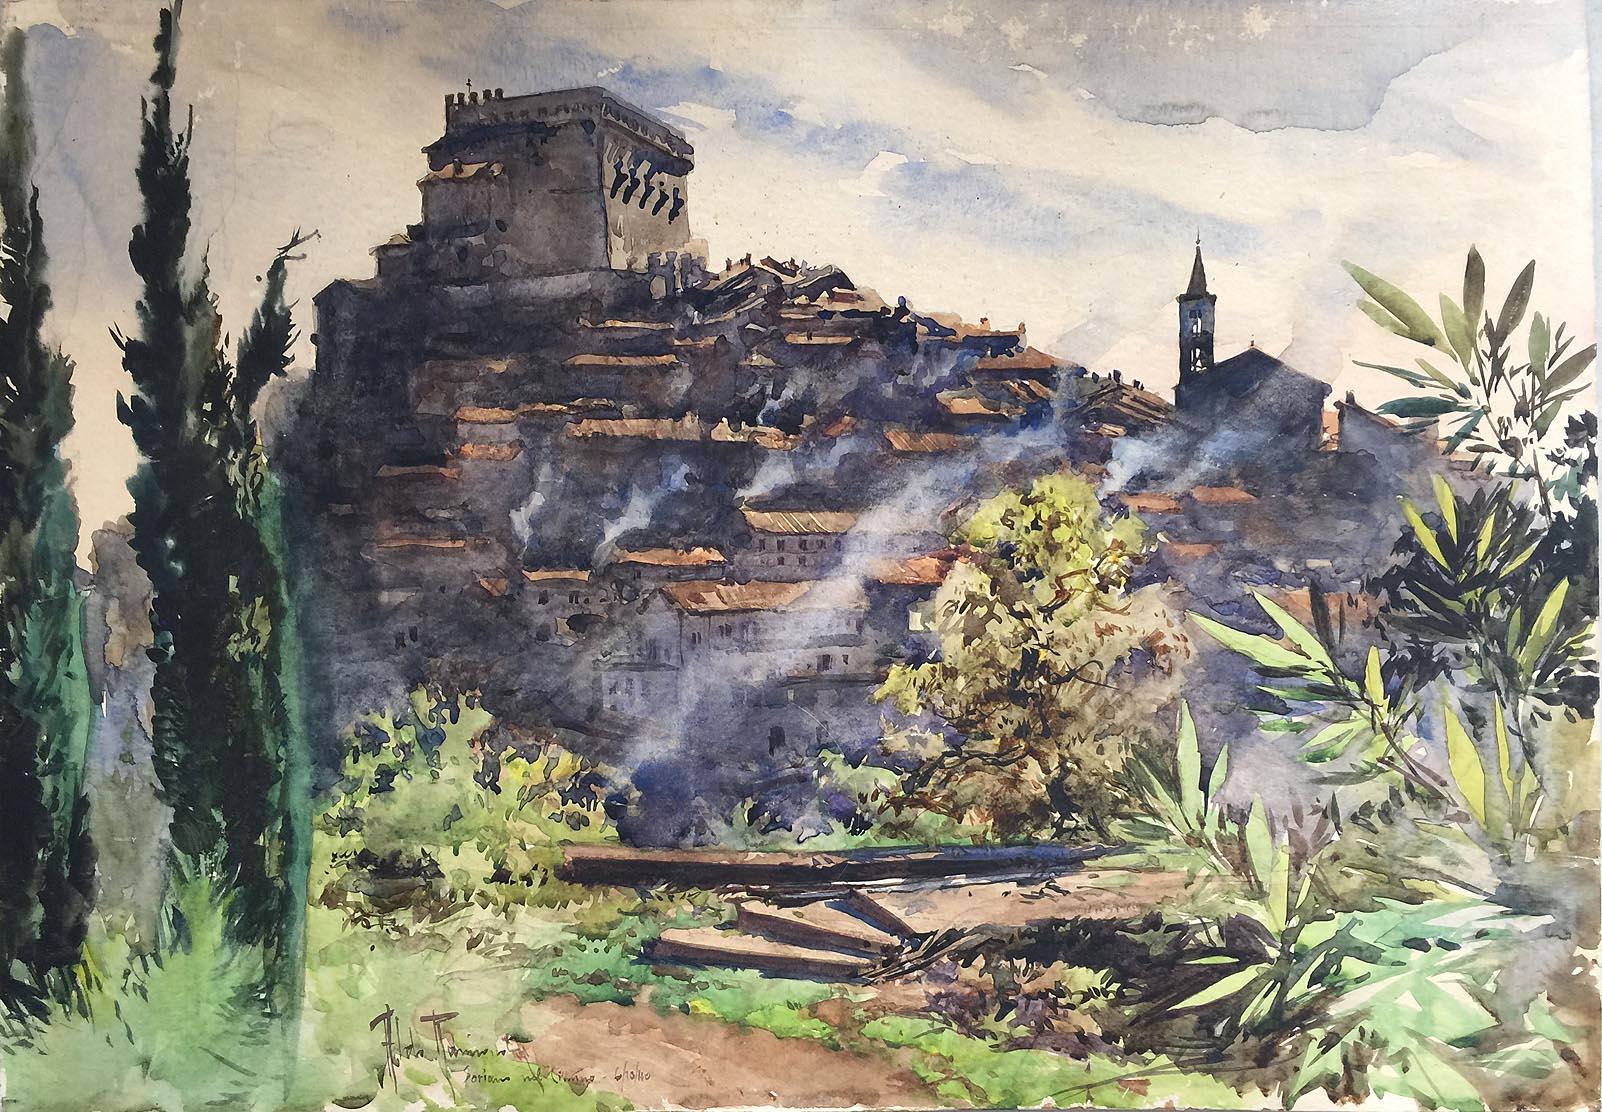 Aldo Raimondo<br><small>Rome 1902 - 1997 Milan</small>